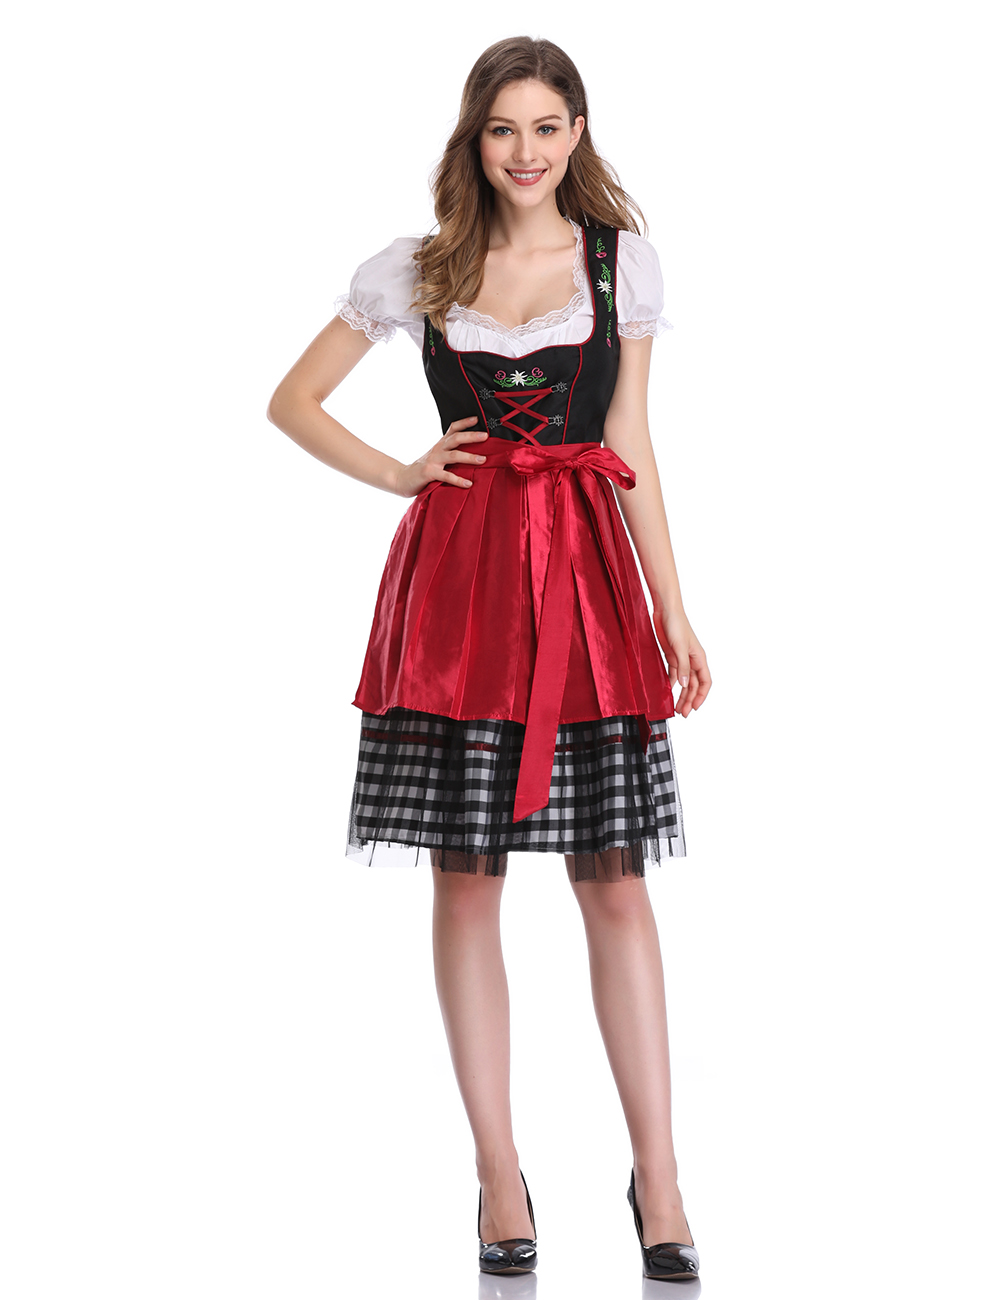 [EU Direct] Women's Oktoberfest Plaid Mesh Stitching Embroidery A Line Formal Dresses Suit